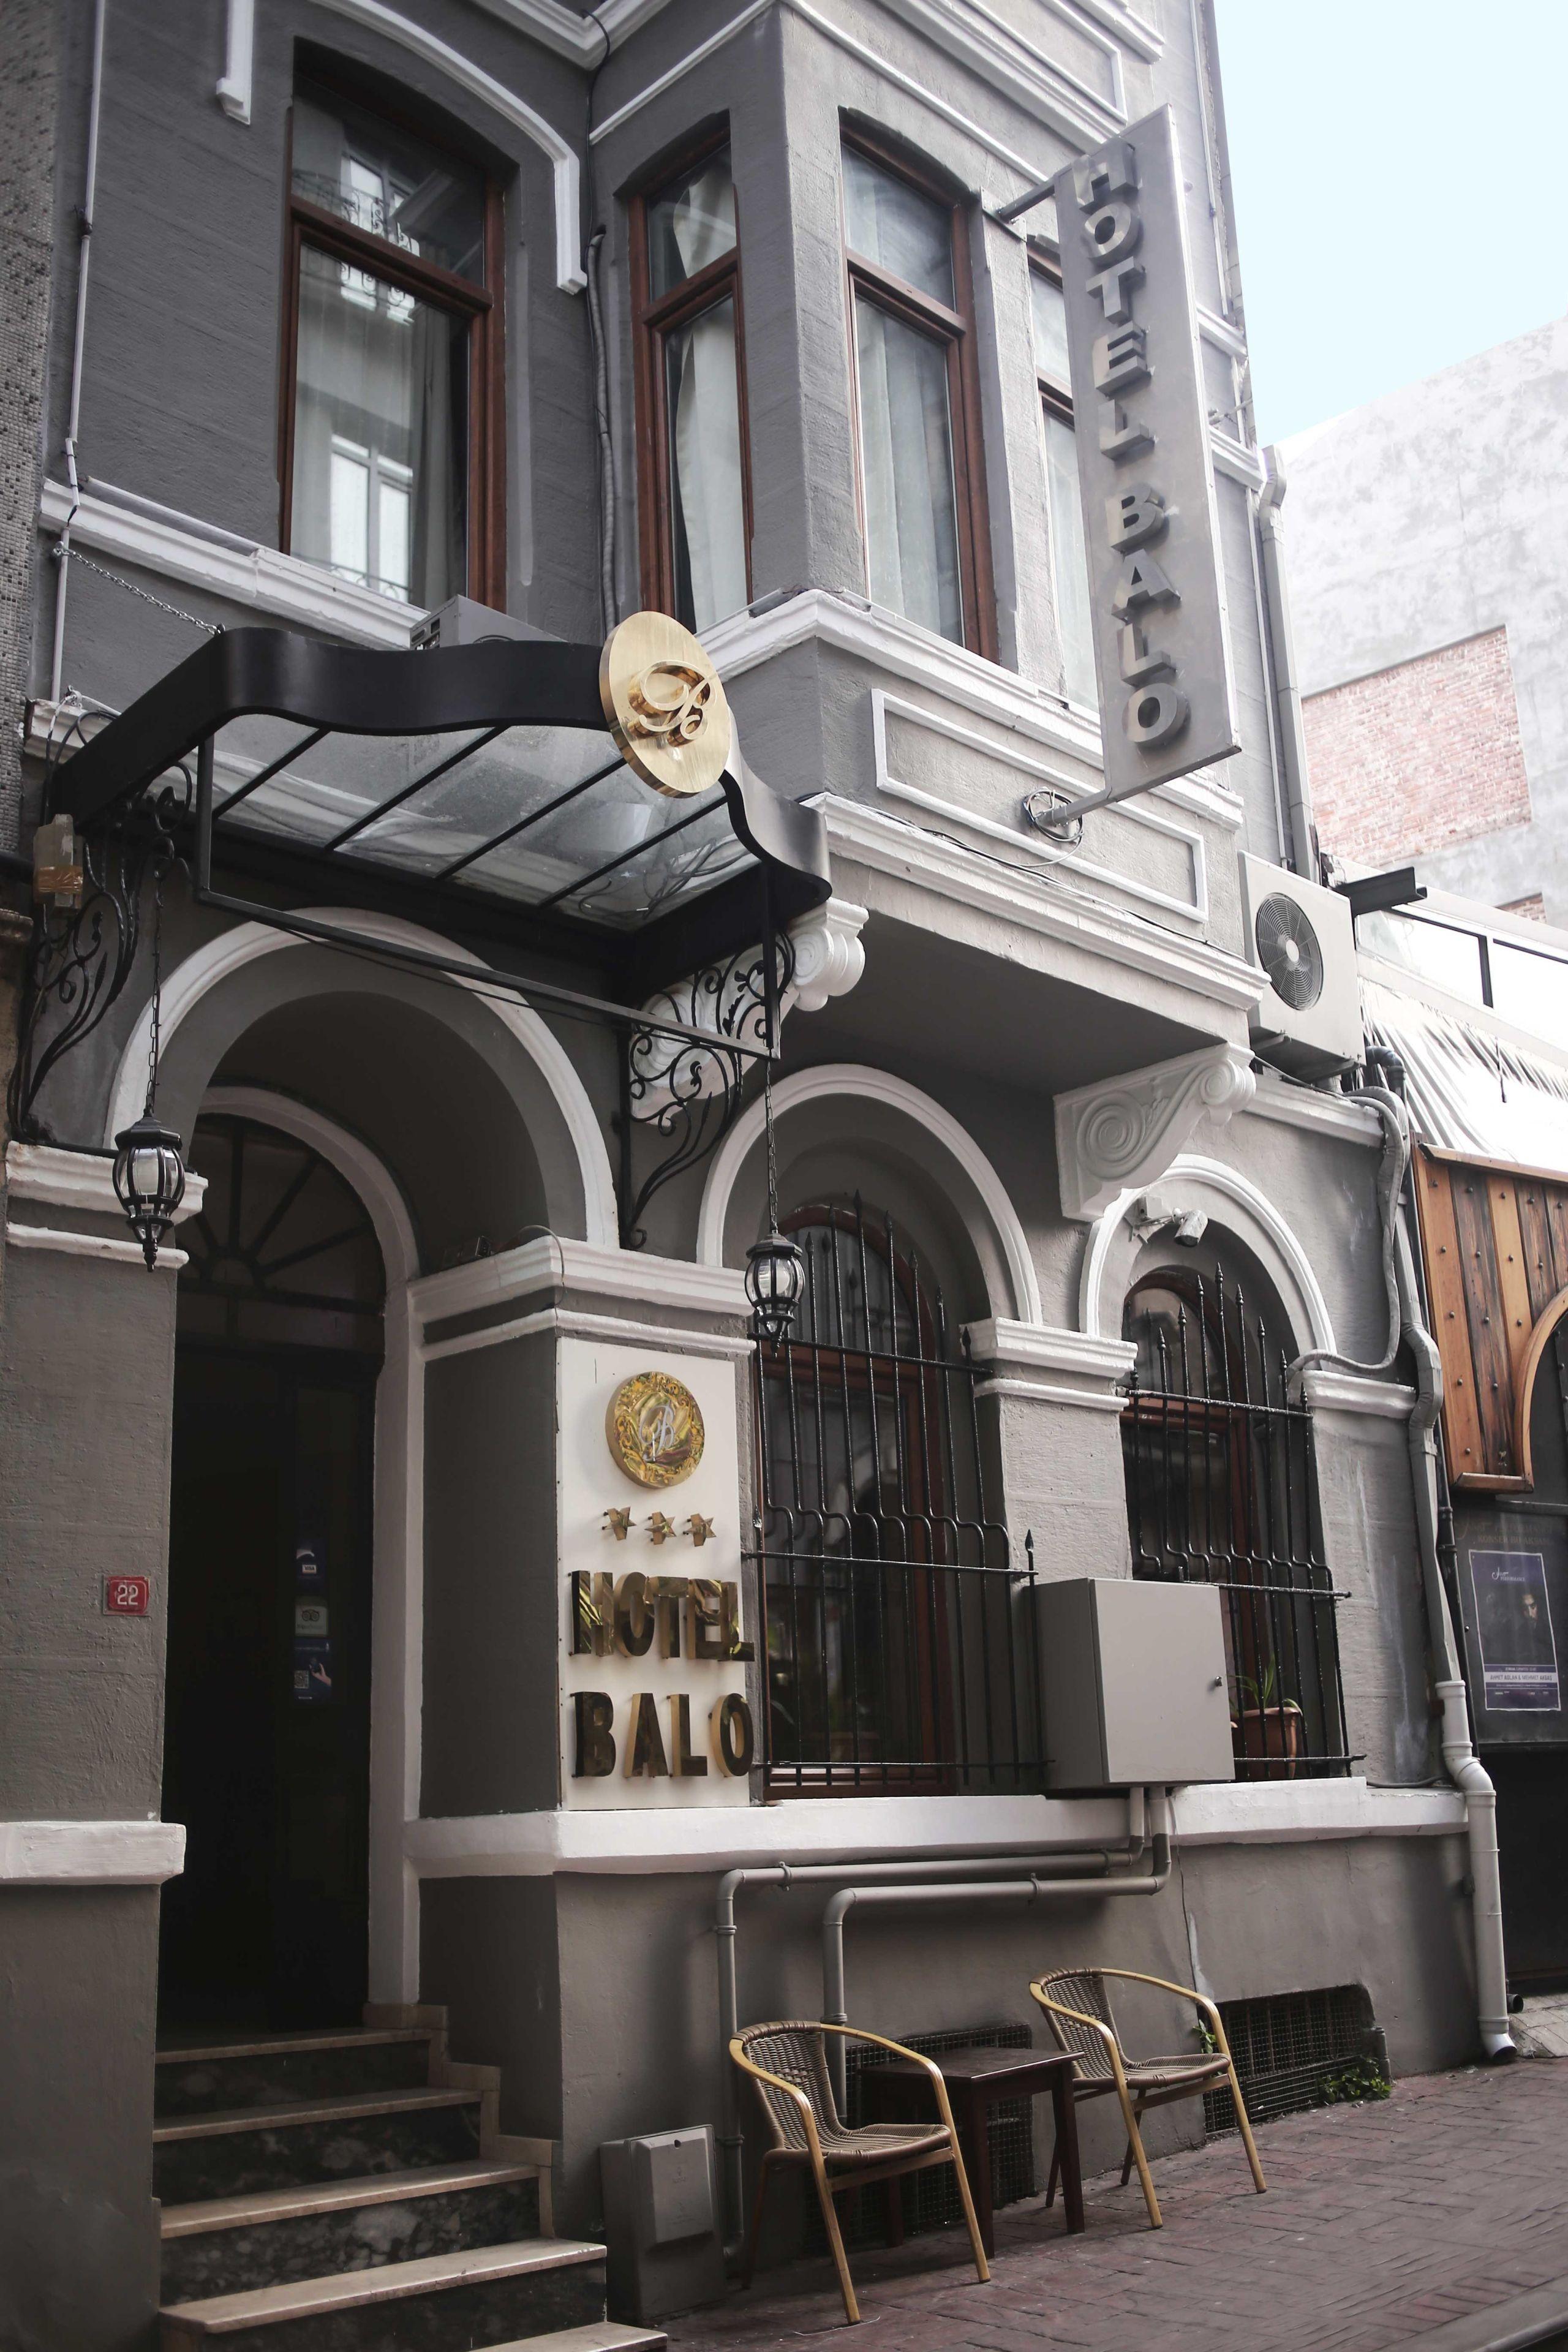 Balo Hotel